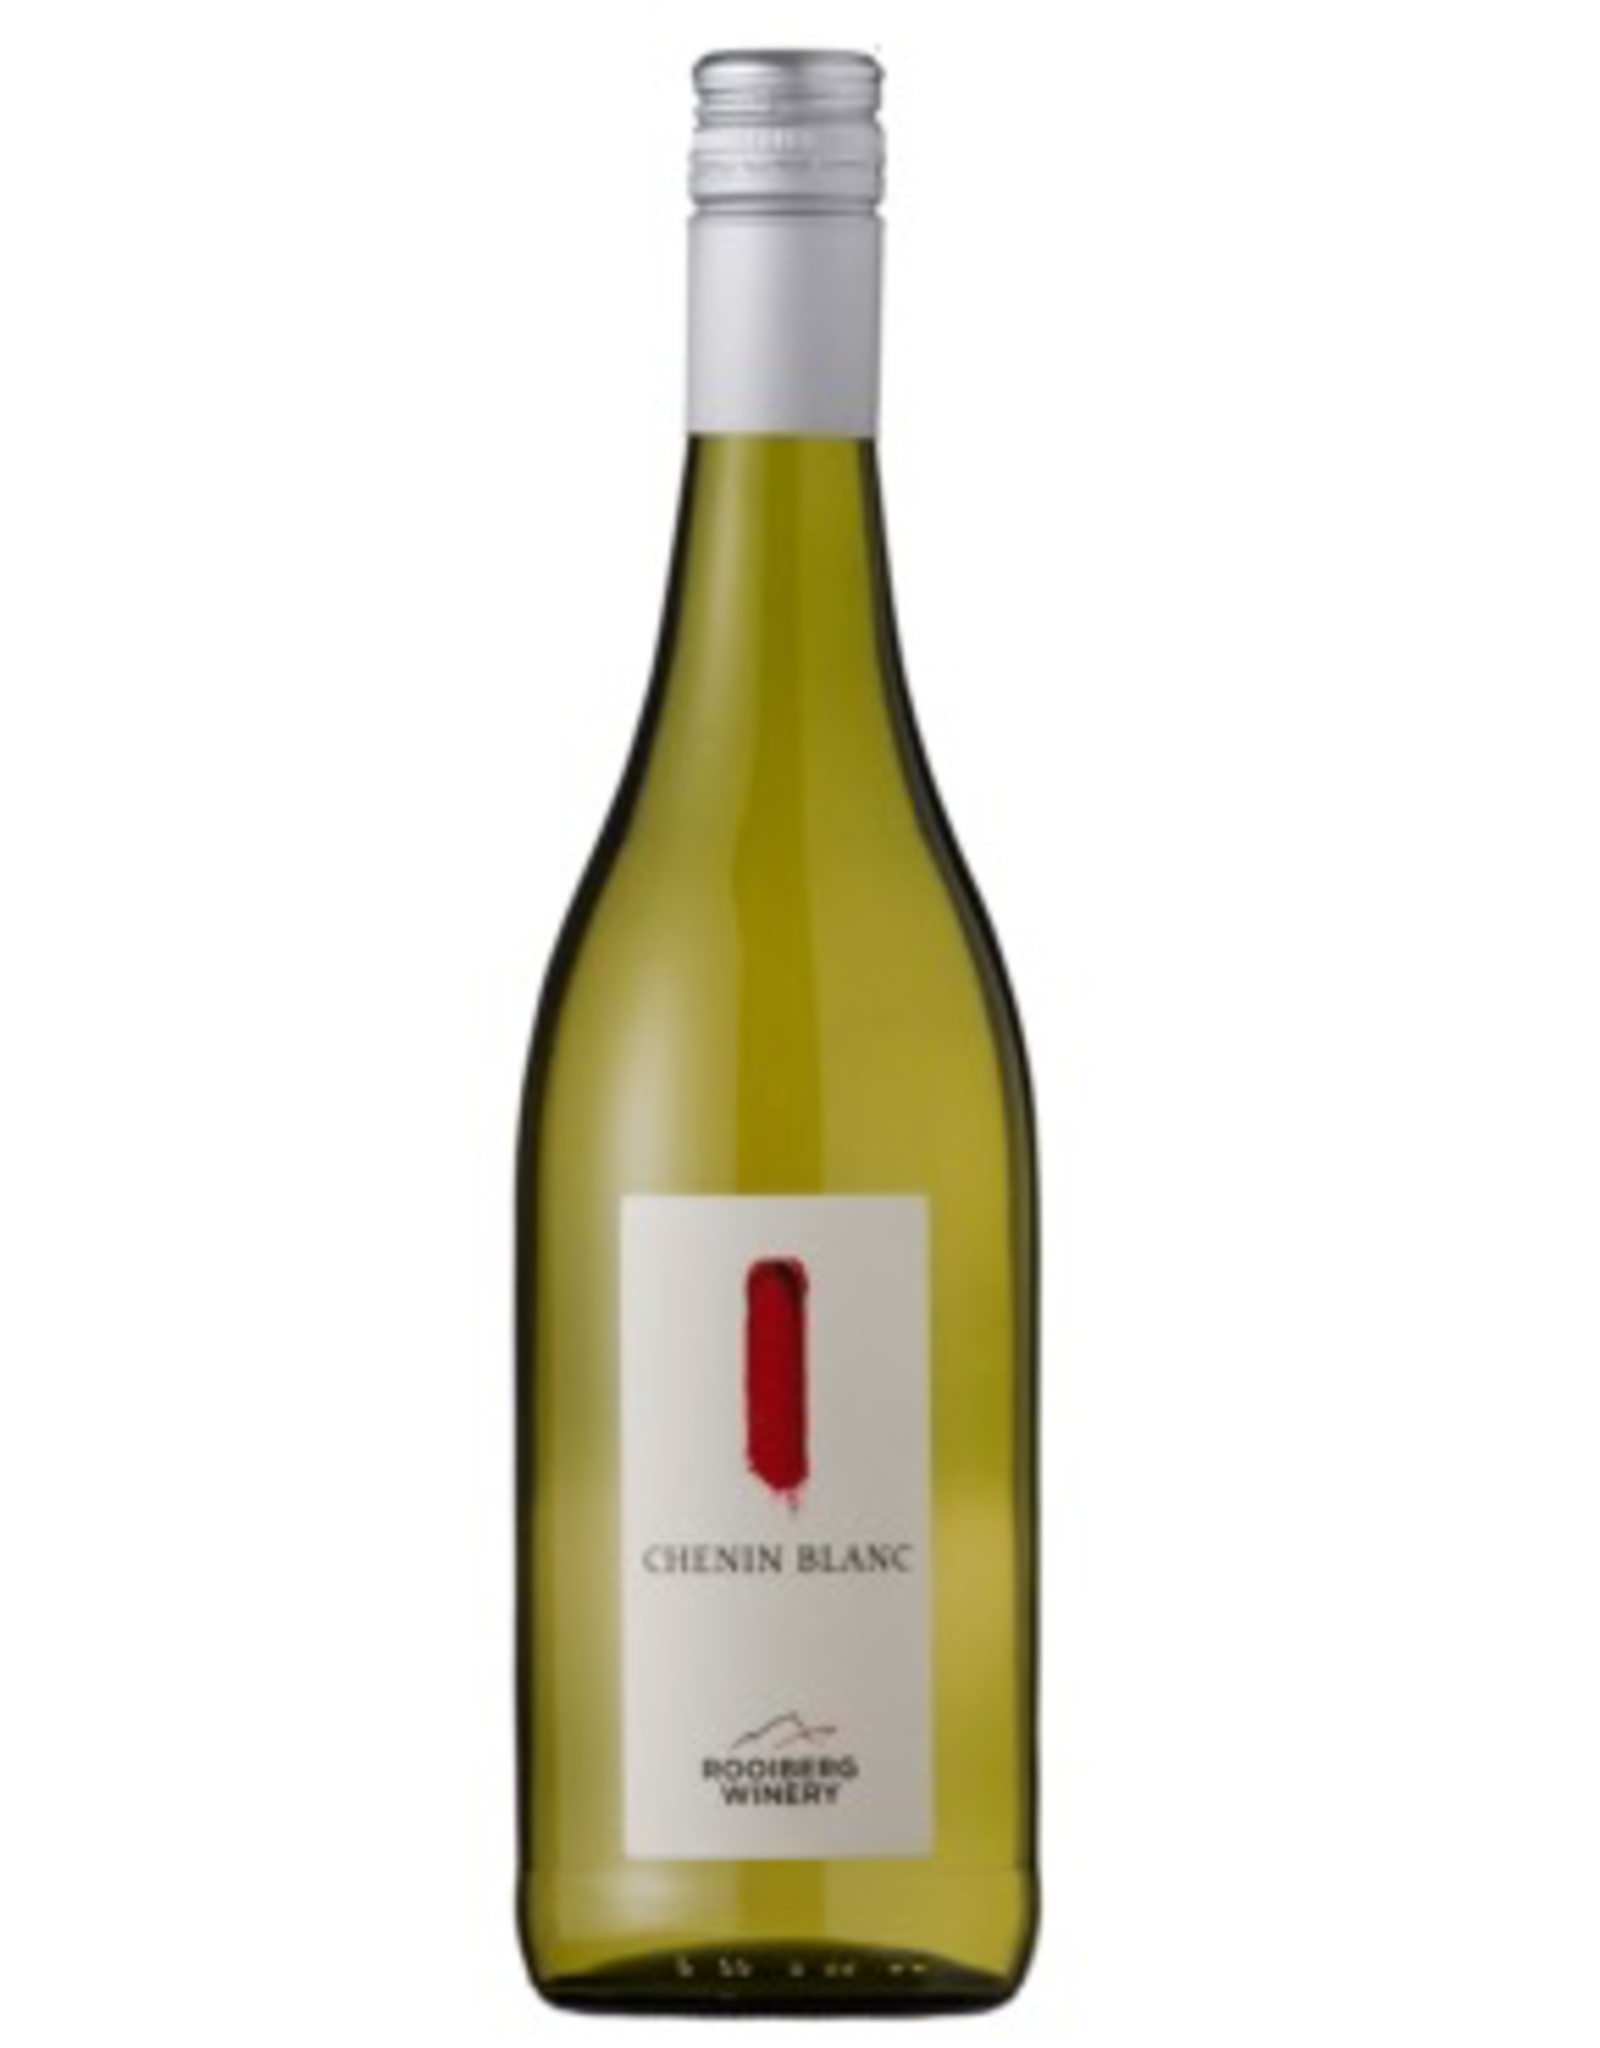 White Wine 2016, Rooiberg Winery, Chenin Blanc, Robertson, Coastal Region, South Africa, 12.5% Alc, CTnr, TW91